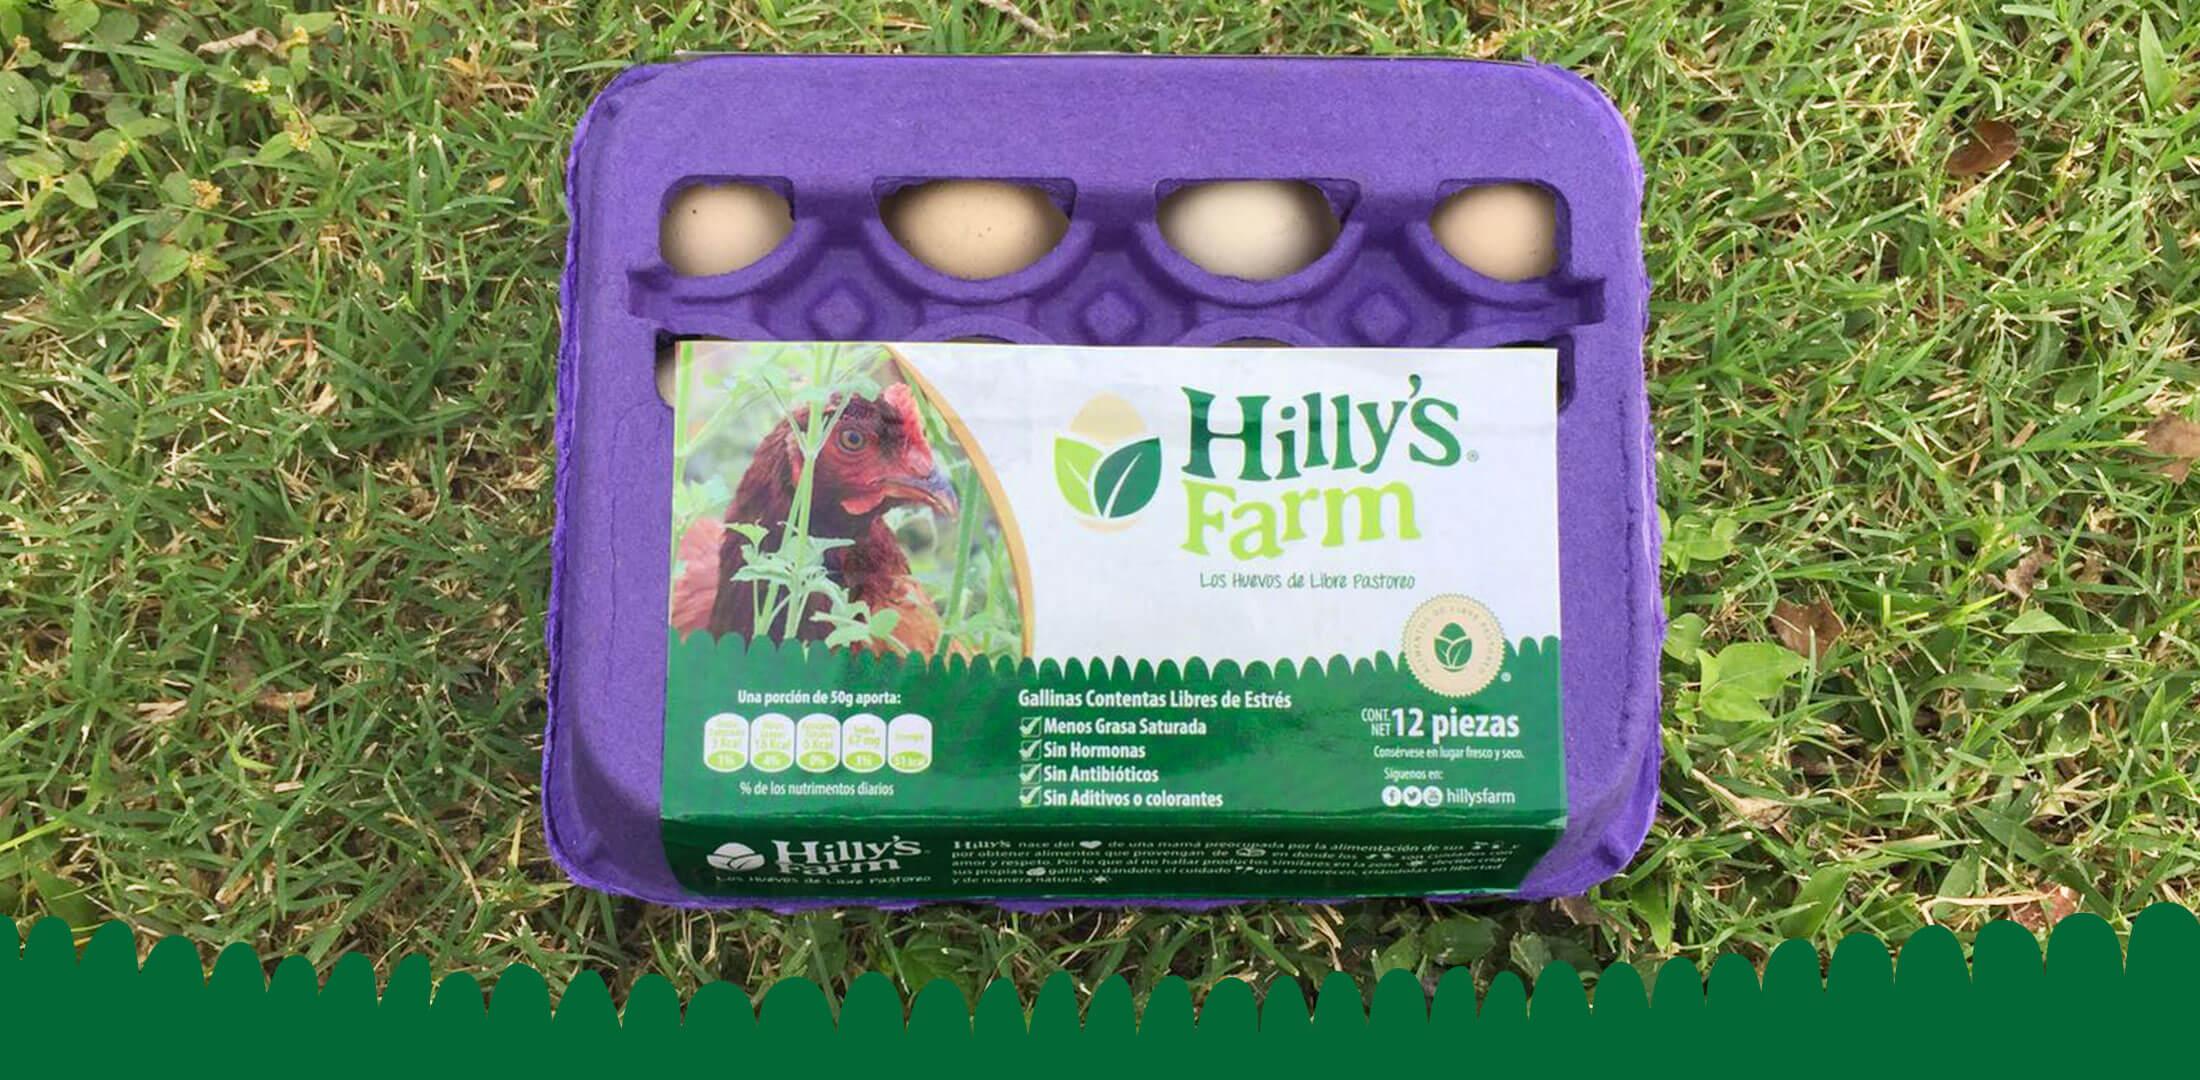 Diseño de Etiqueta para Empaque de Huevos de Libre Pastoreo Hillys Farm - Lilian Feres